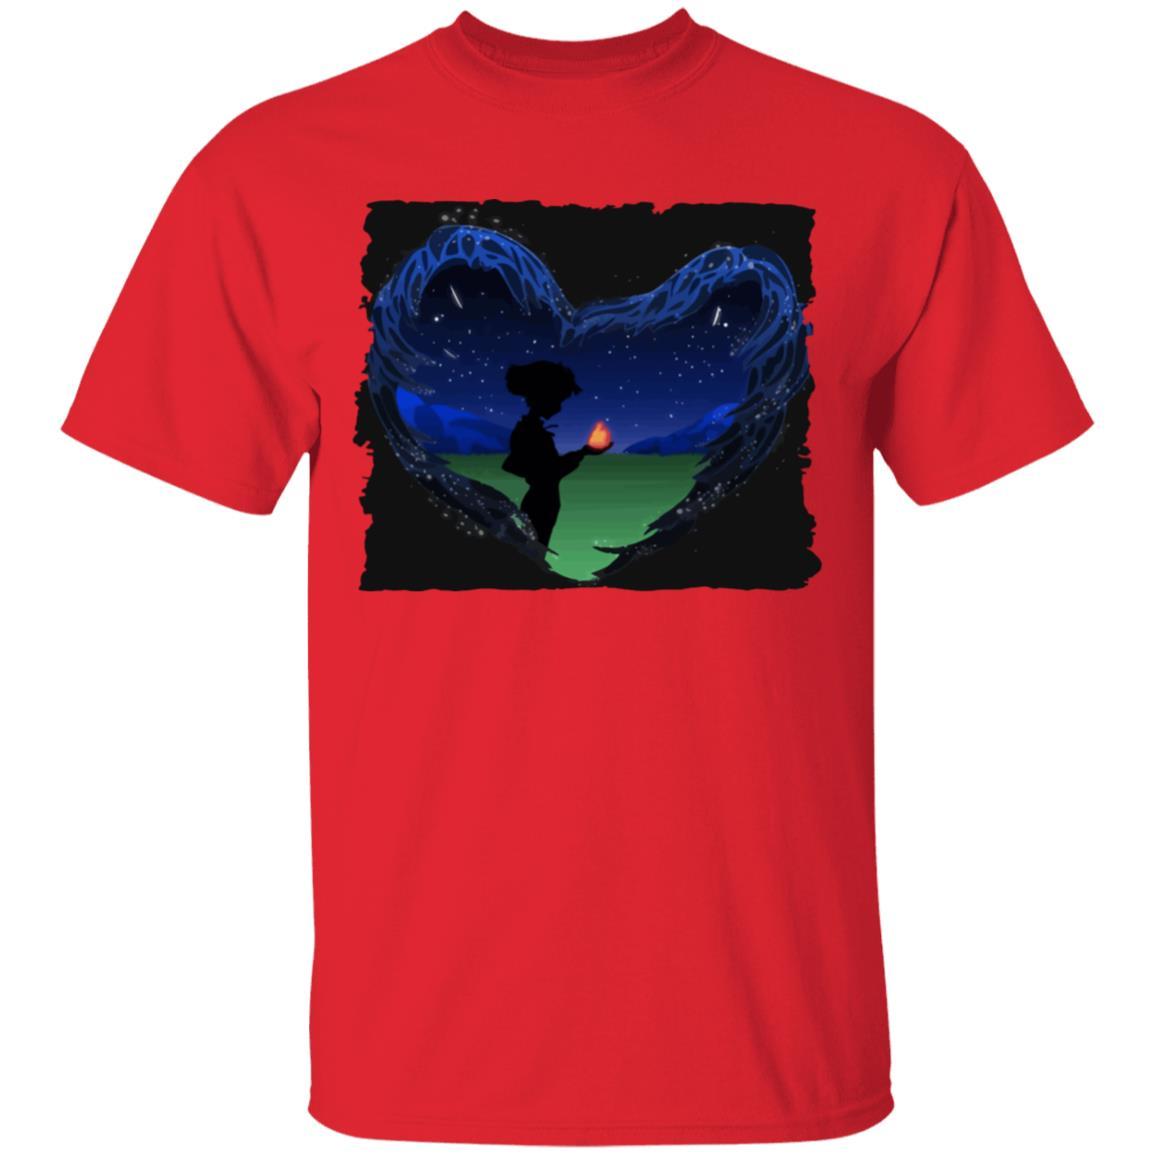 Howl's Moving Castle – Howl meets Calcifer Classic T Shirt